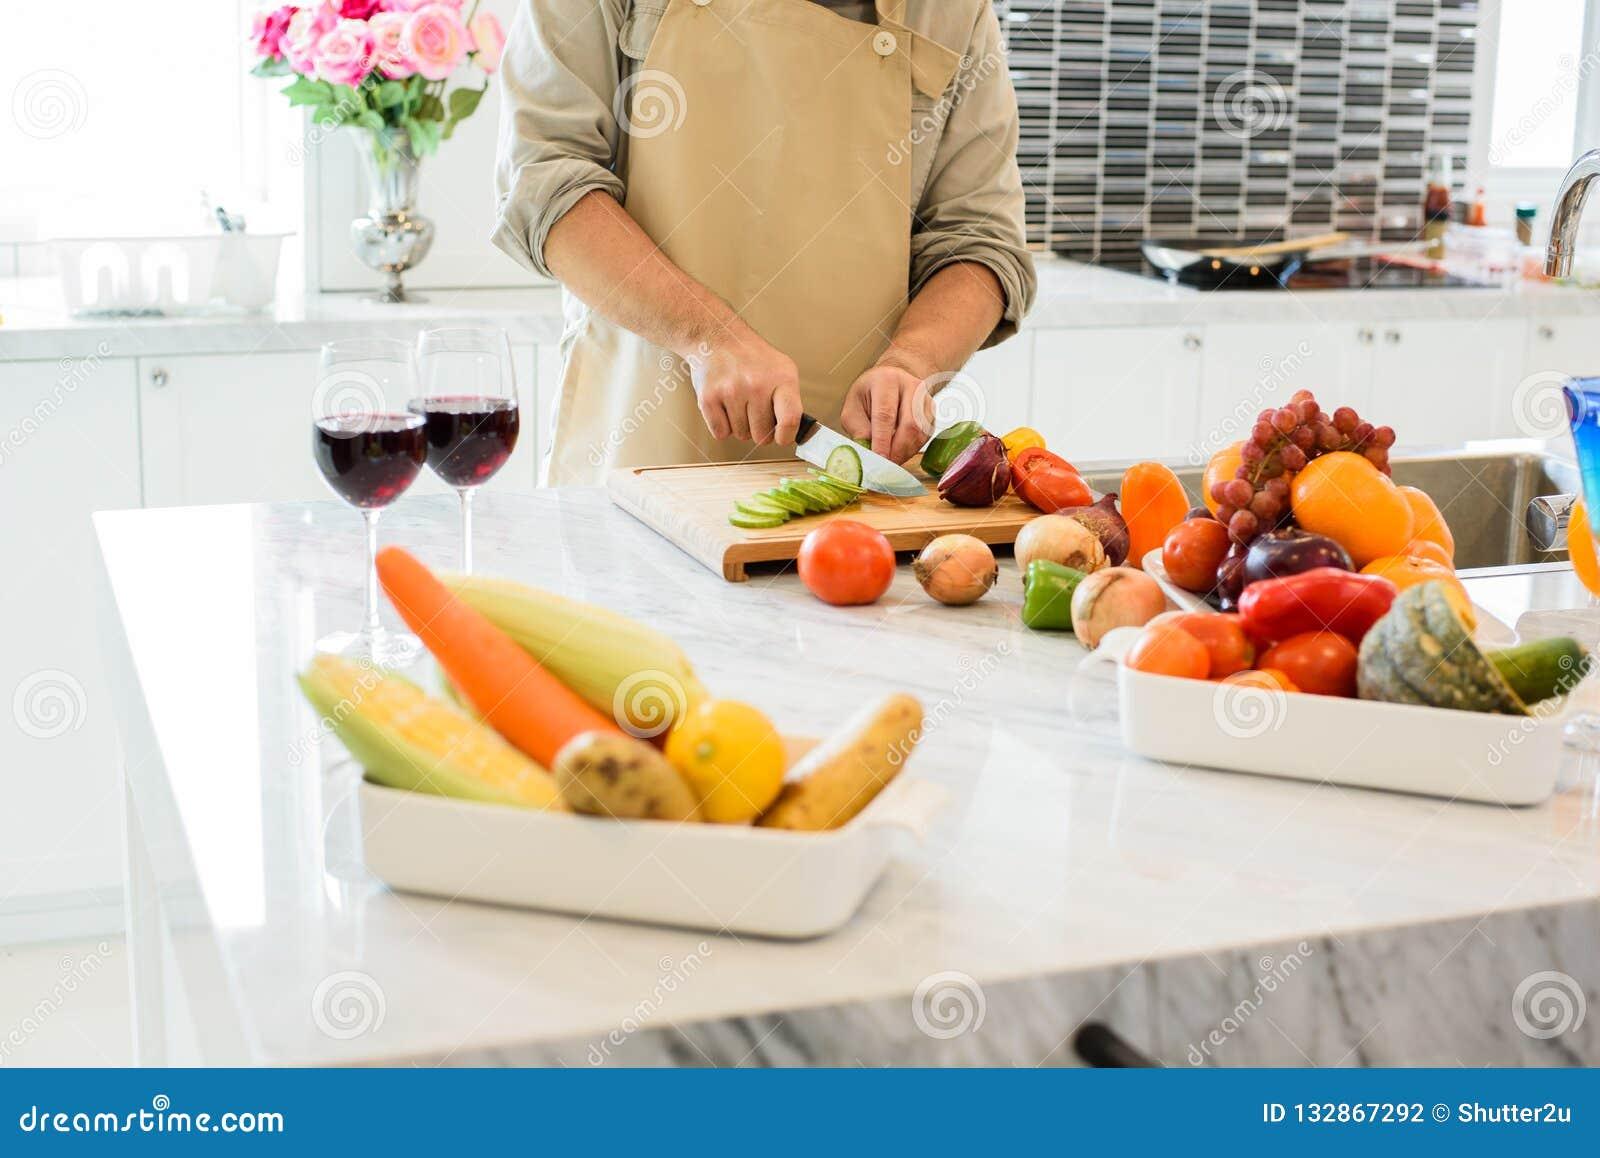 Mensen kokende en snijdende groente in de keuken Mensen en lif